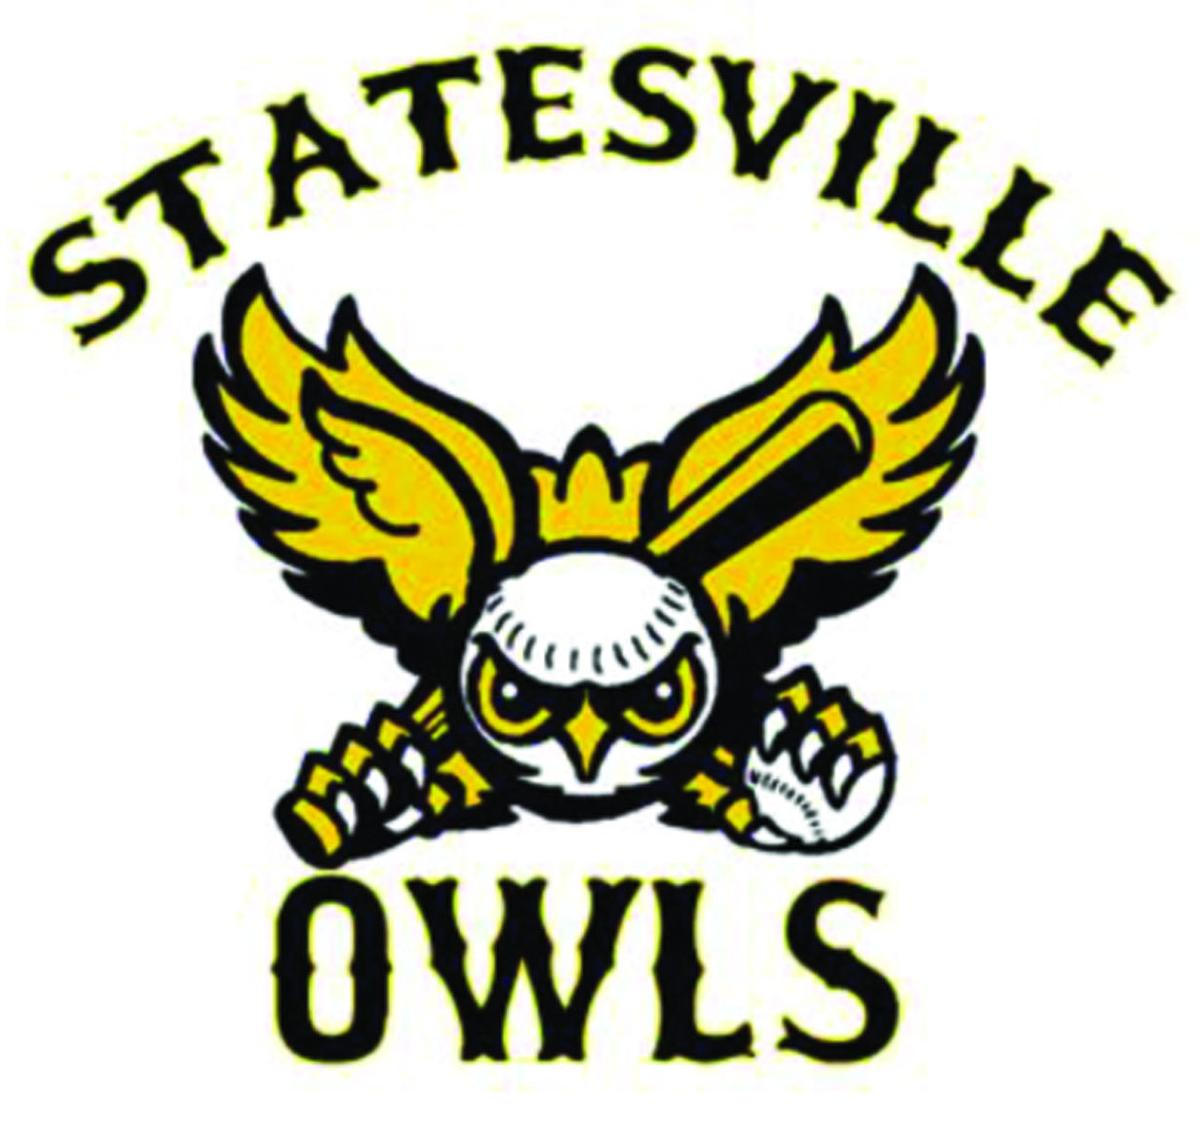 Statesville Owls logo